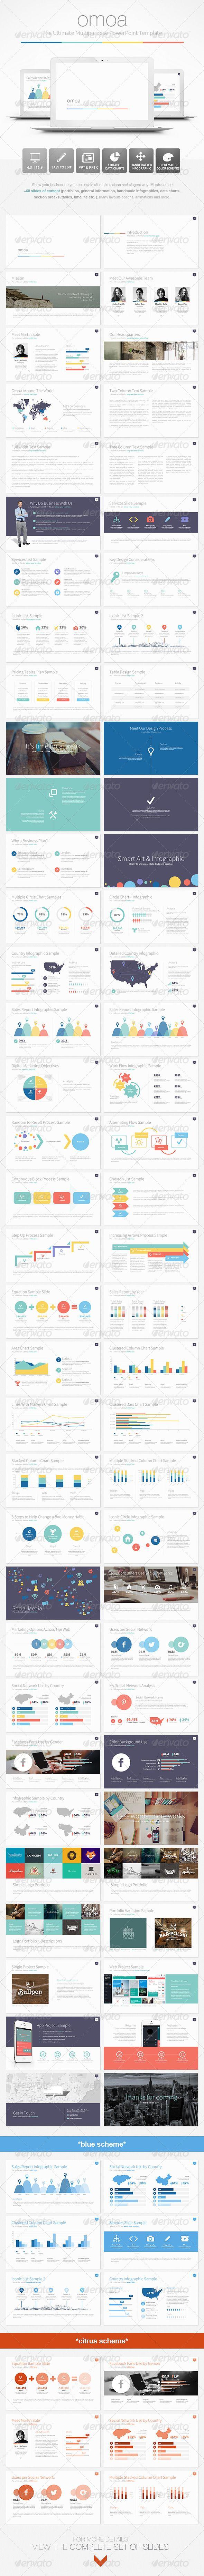 Omoa   Ultimate Multipurpose PowerPoint Template (Powerpoint Templates) #Powerpoint #Powerpoint_Template #Presentation